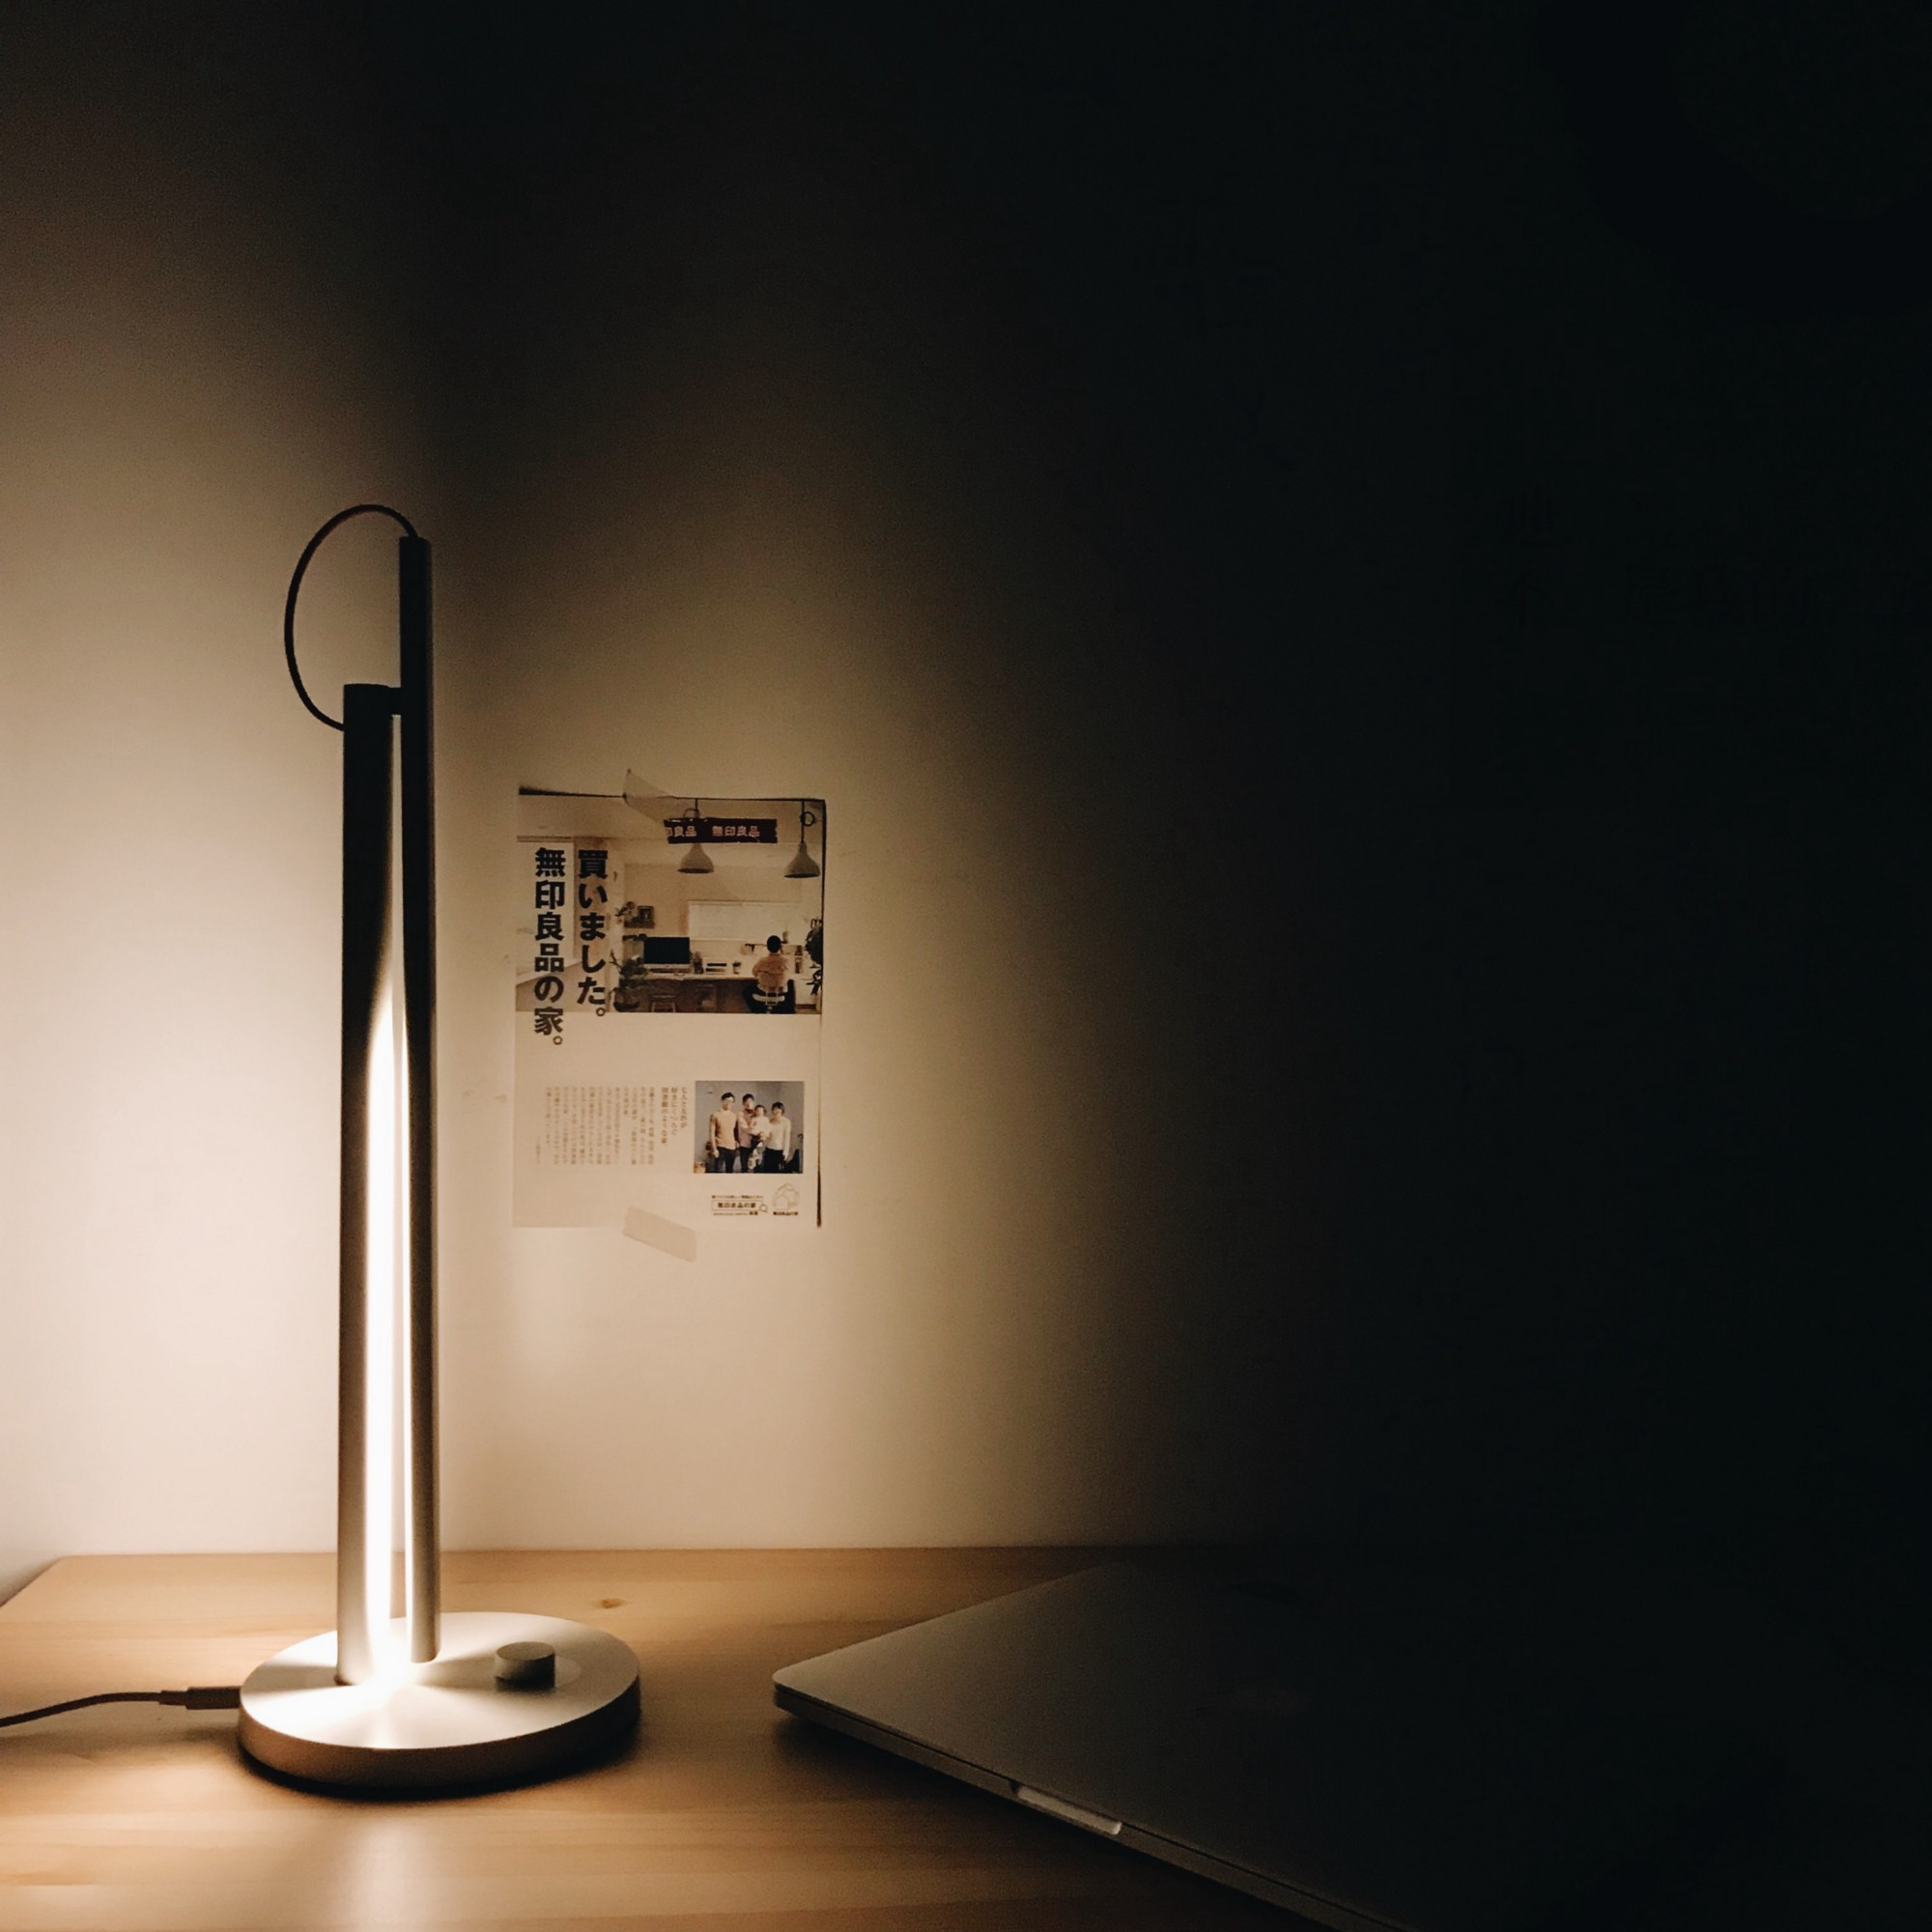 小米 LED 智慧檯燈開箱心得分享 – Yueh - Life and Tech – Medium